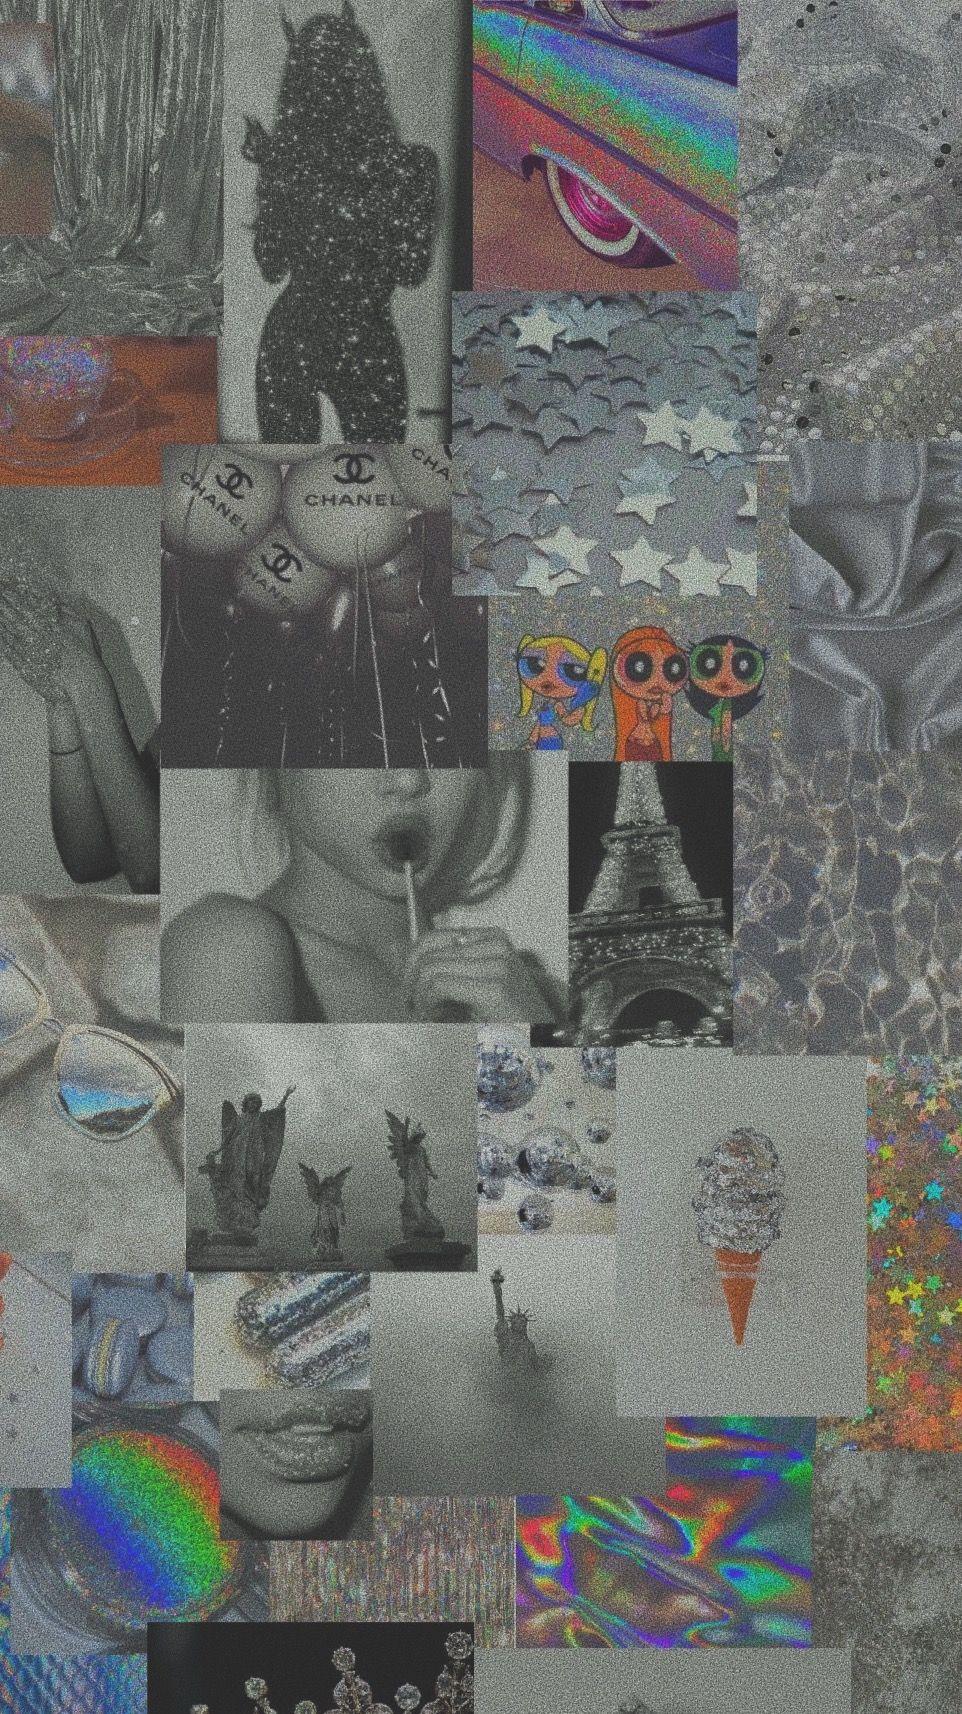 Silver Aesthetic Wallpaper Iphone Wallpaper Tumblr Aesthetic Aesthetic Iphone Wallpaper Pretty Wallpaper Iphone